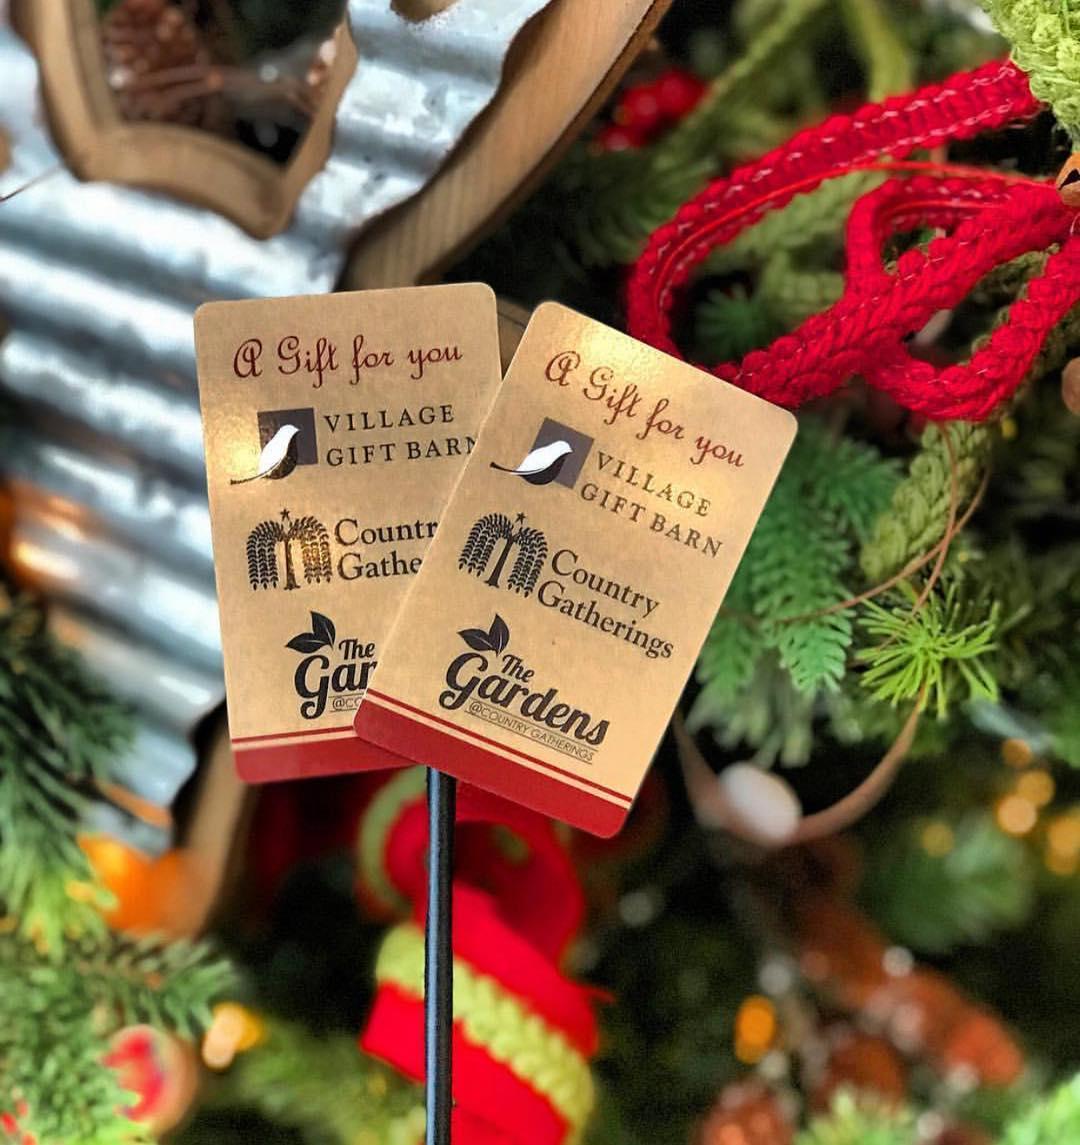 Gift Card Promotion Village Gift Barn